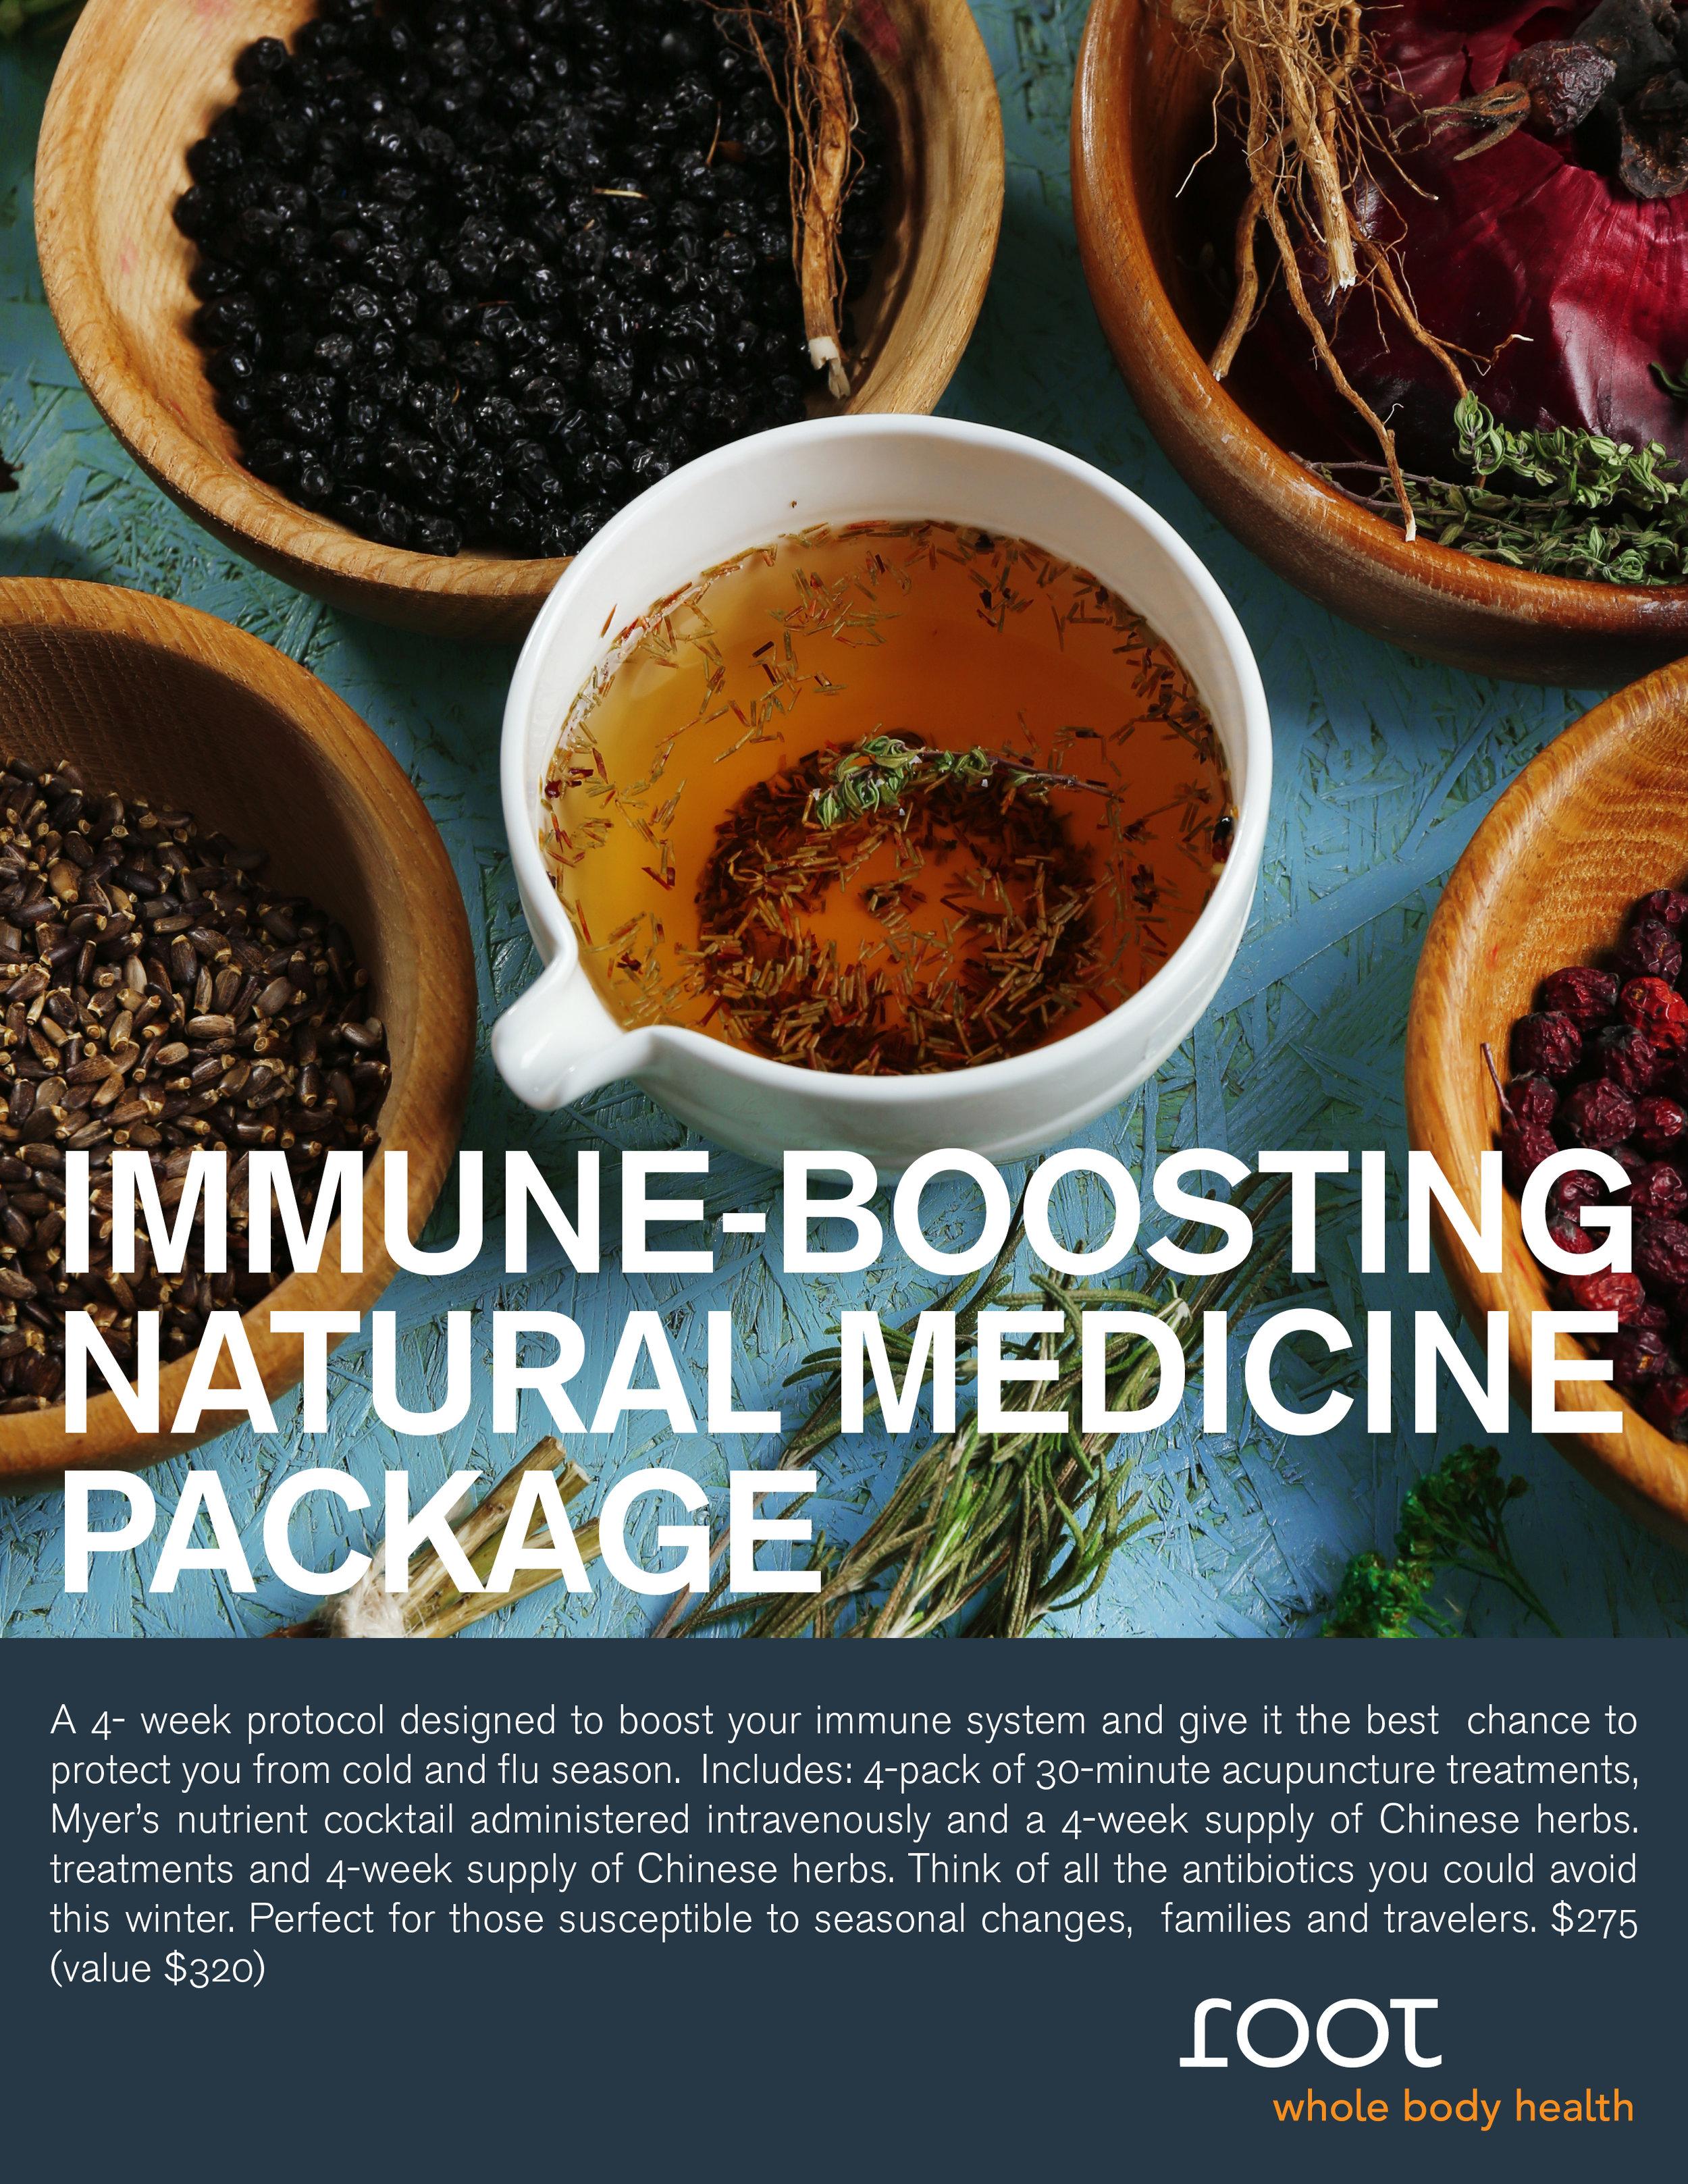 fall2014-immuneboosting